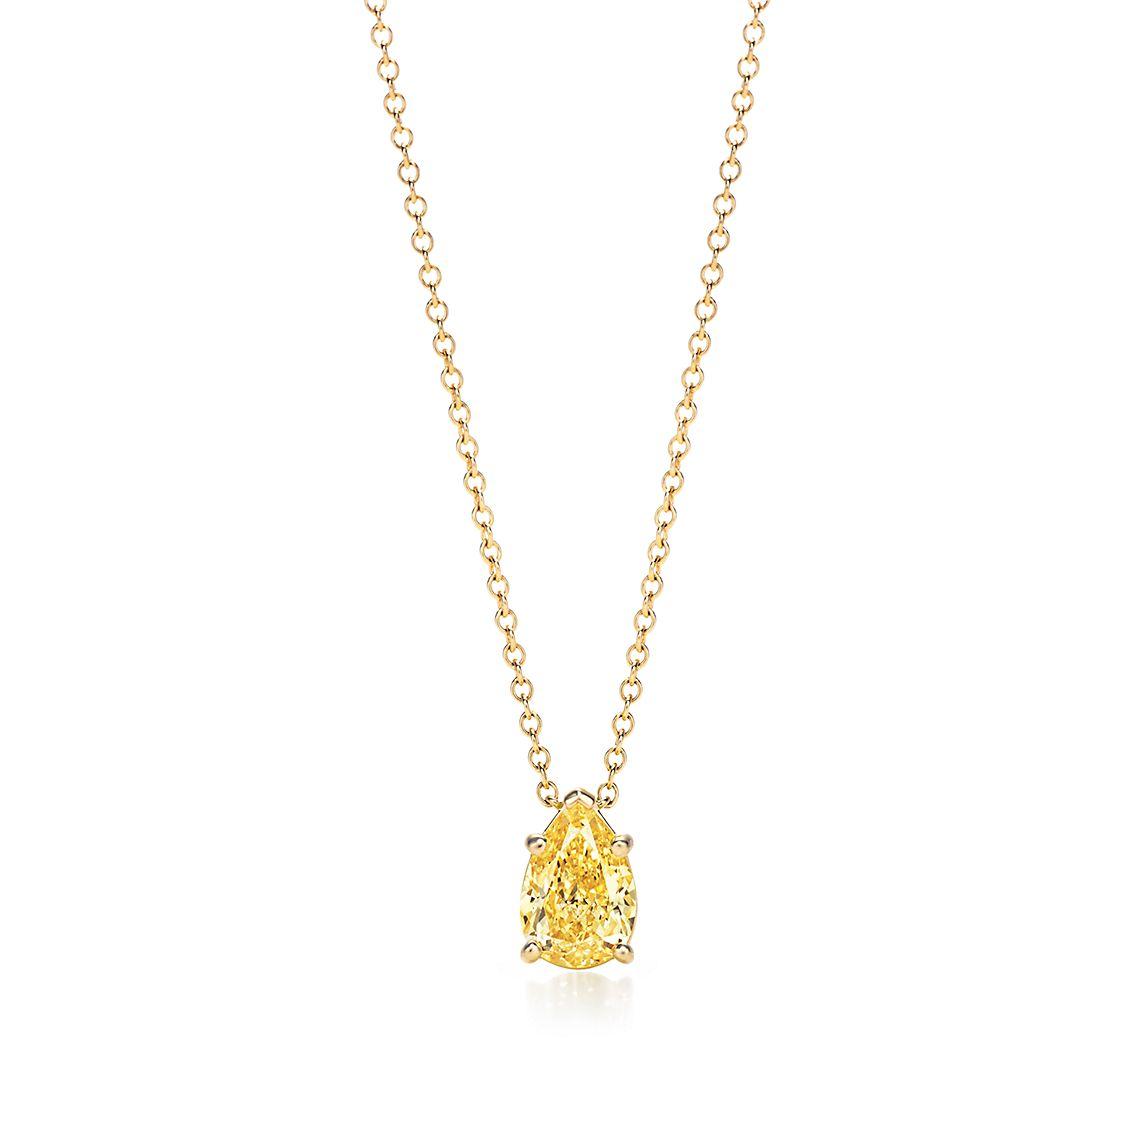 Pear Shaped Yellow Diamond Pendant by Tiffany & Co.